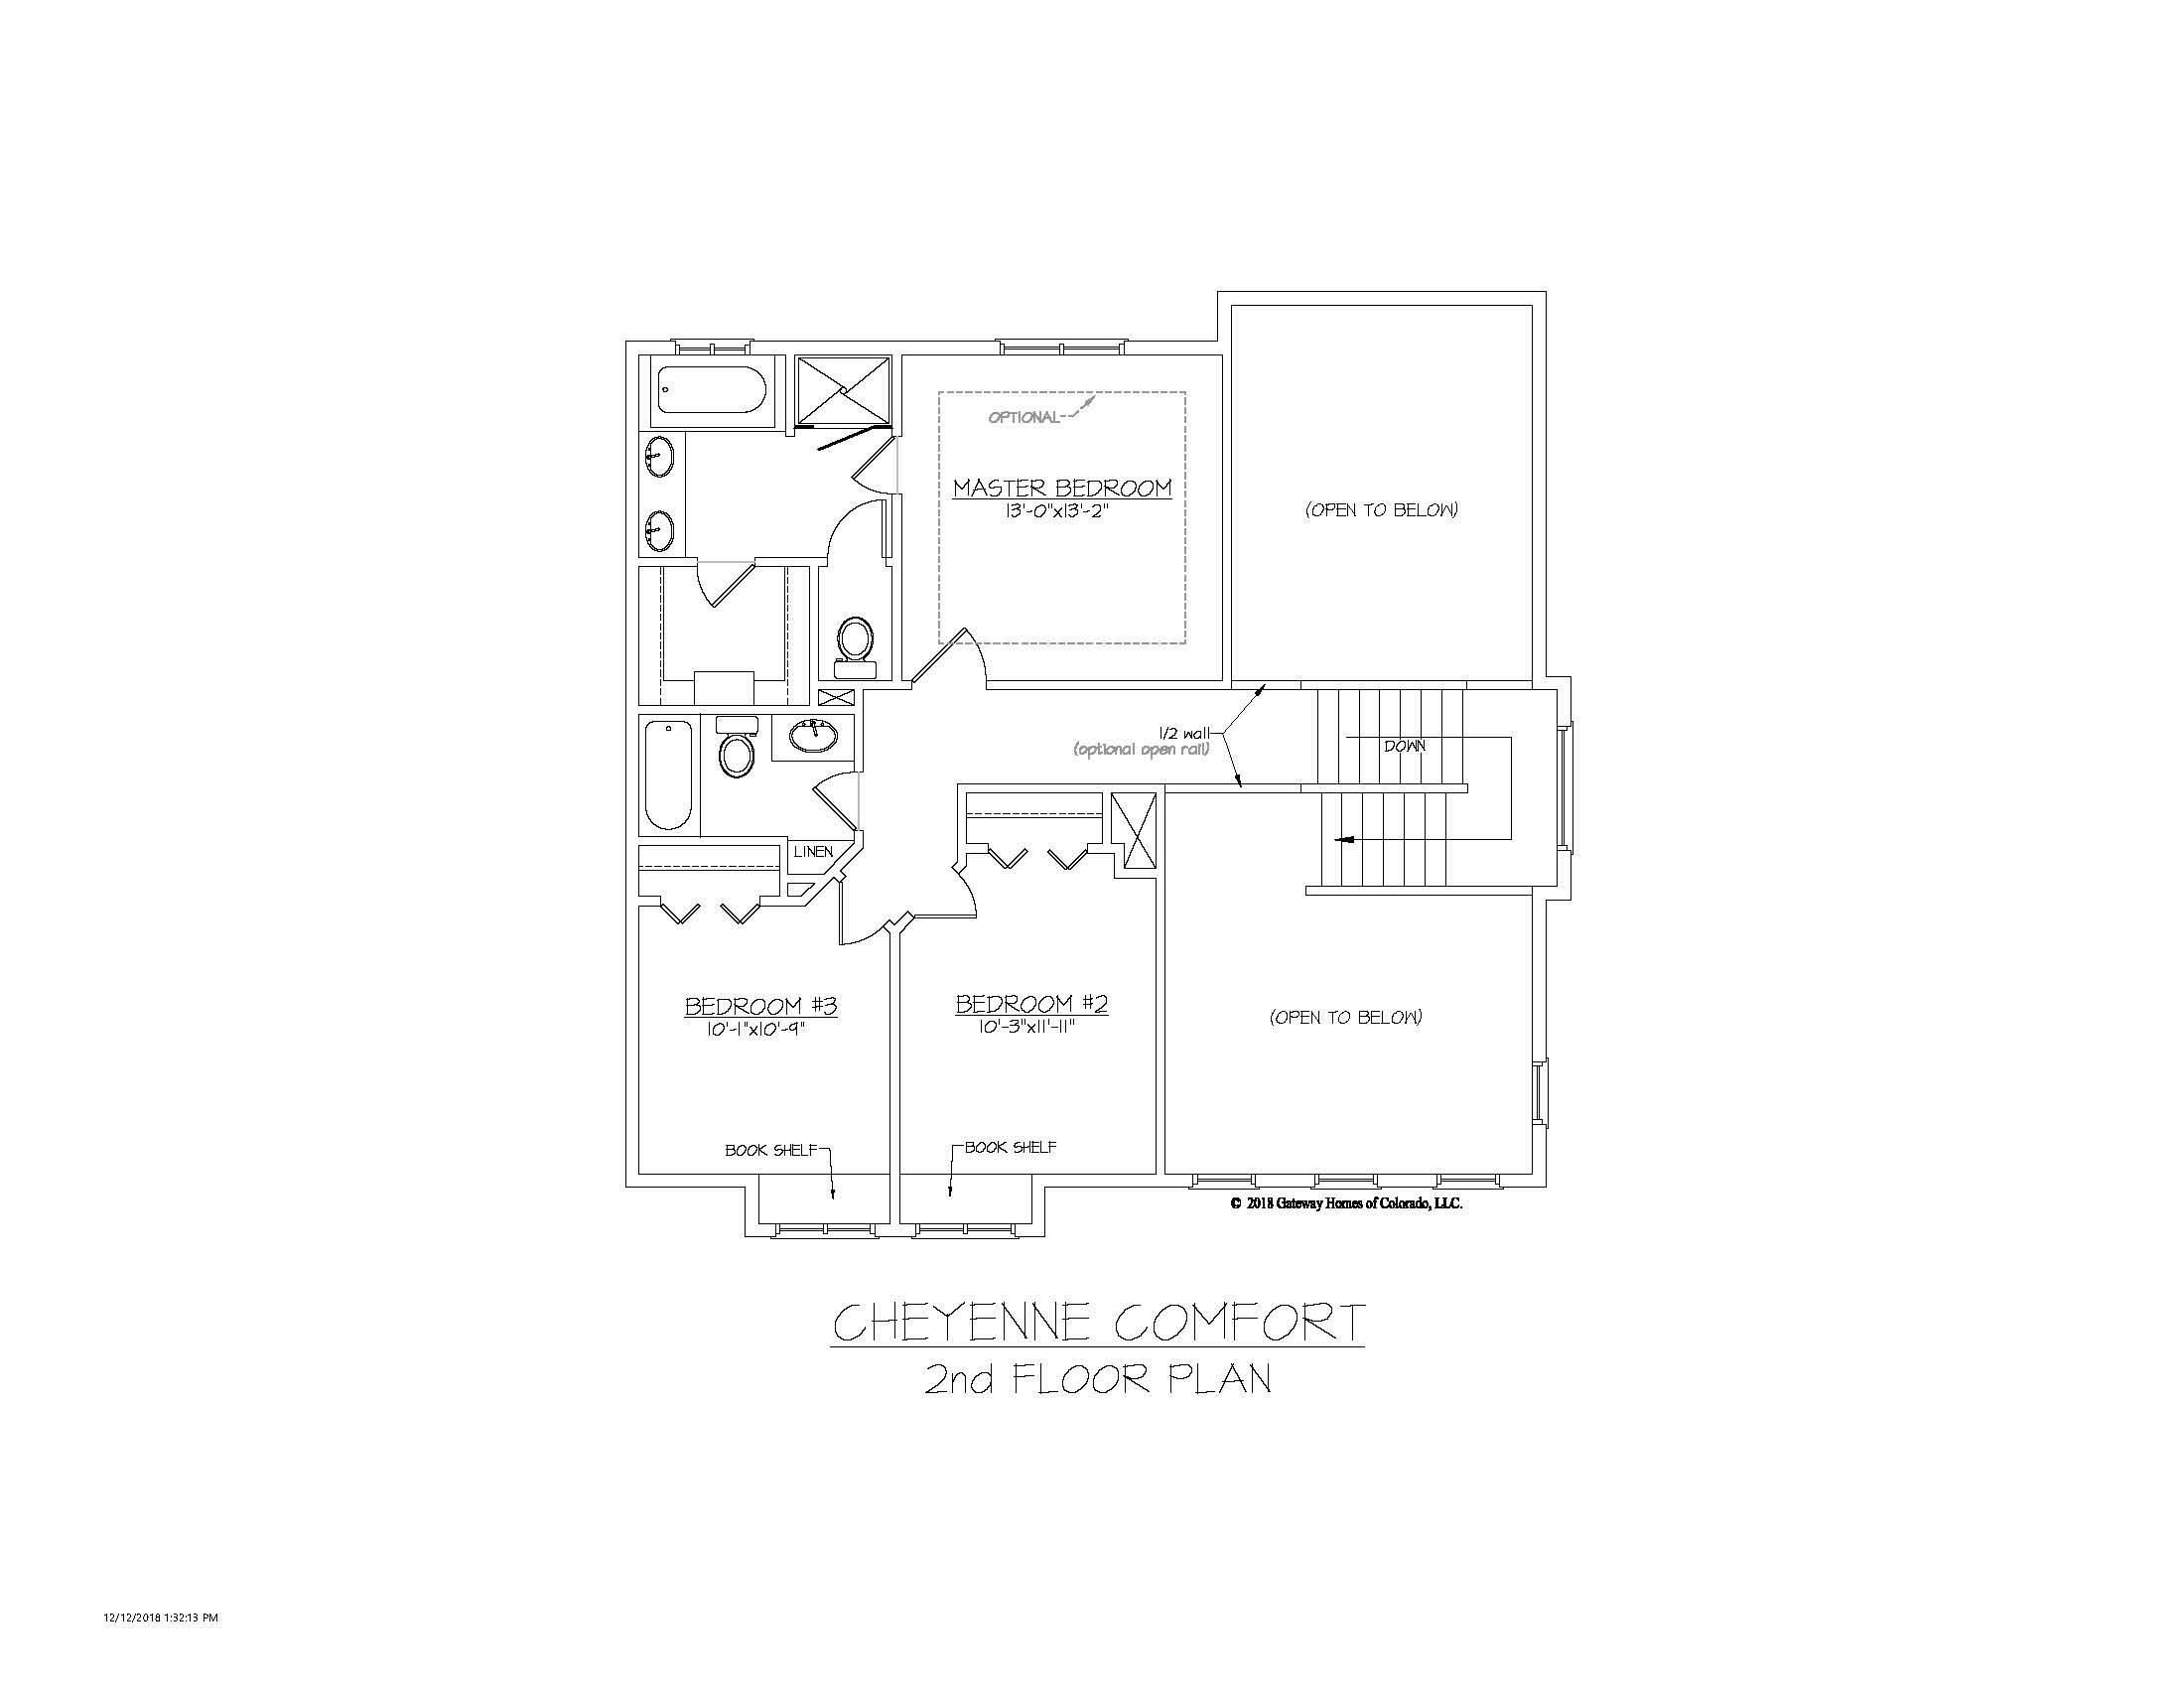 SM Cheyenne Comfort 2nd Floor Plan